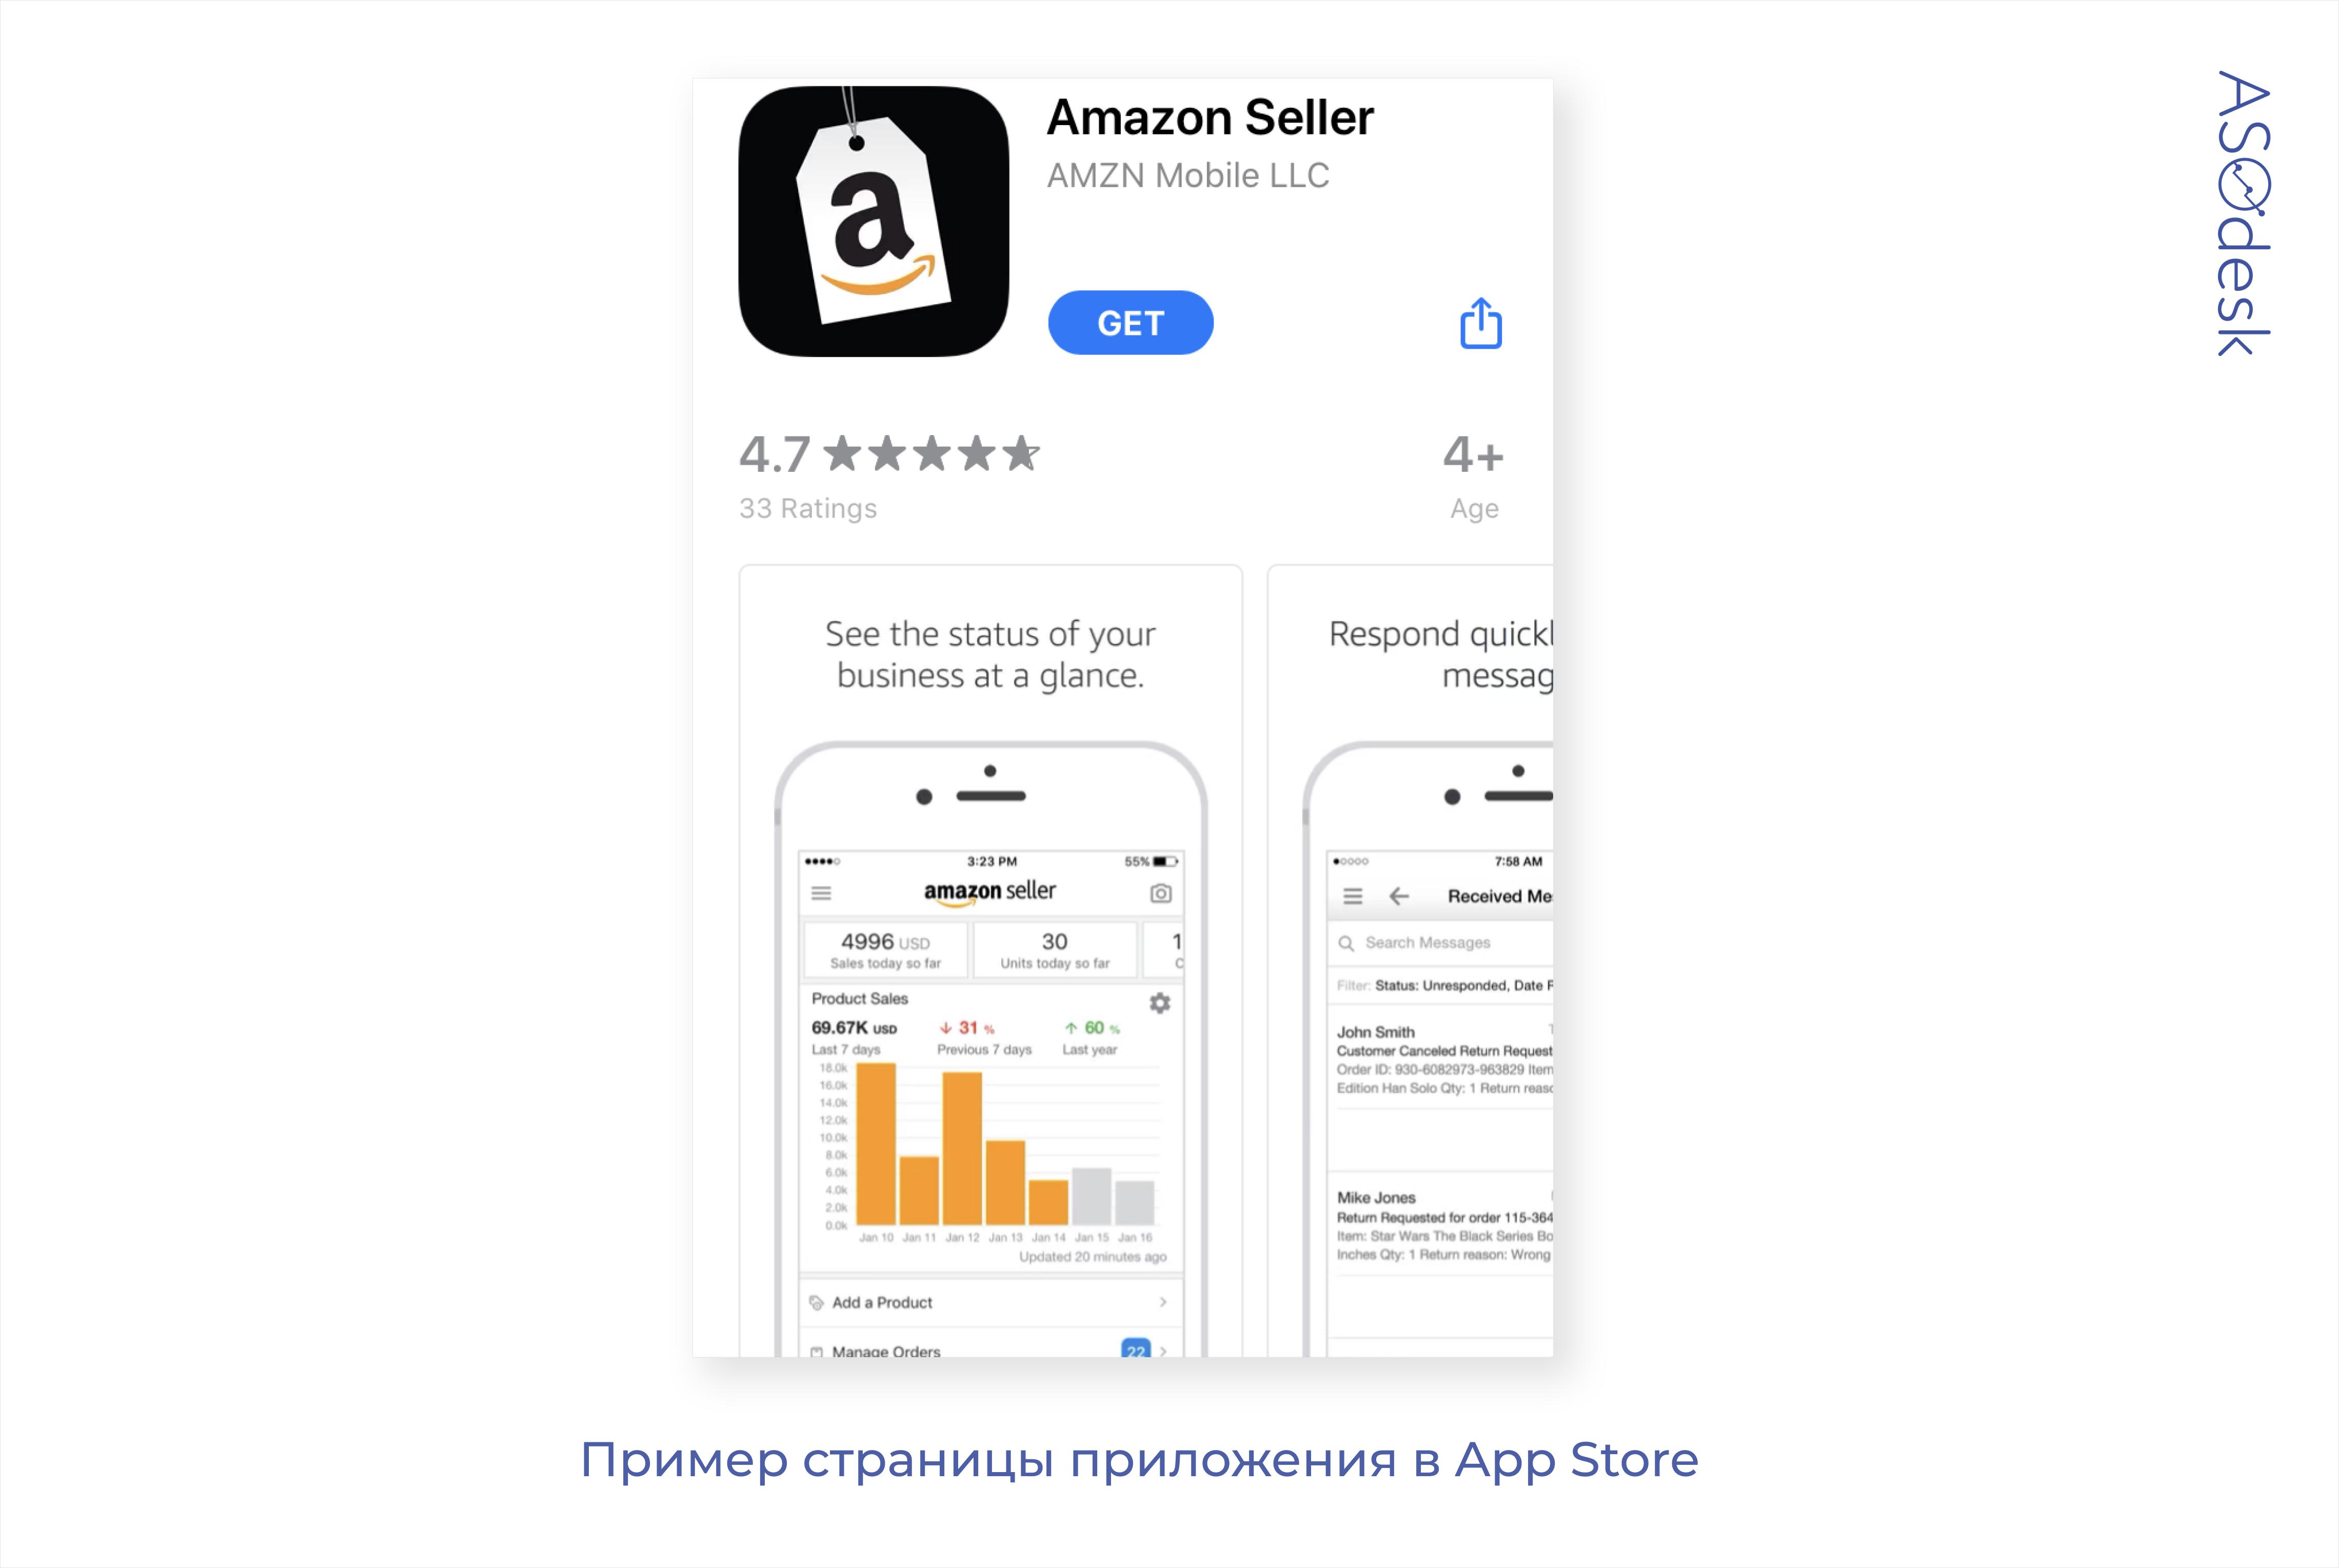 Страница приложения Amazon в App Store